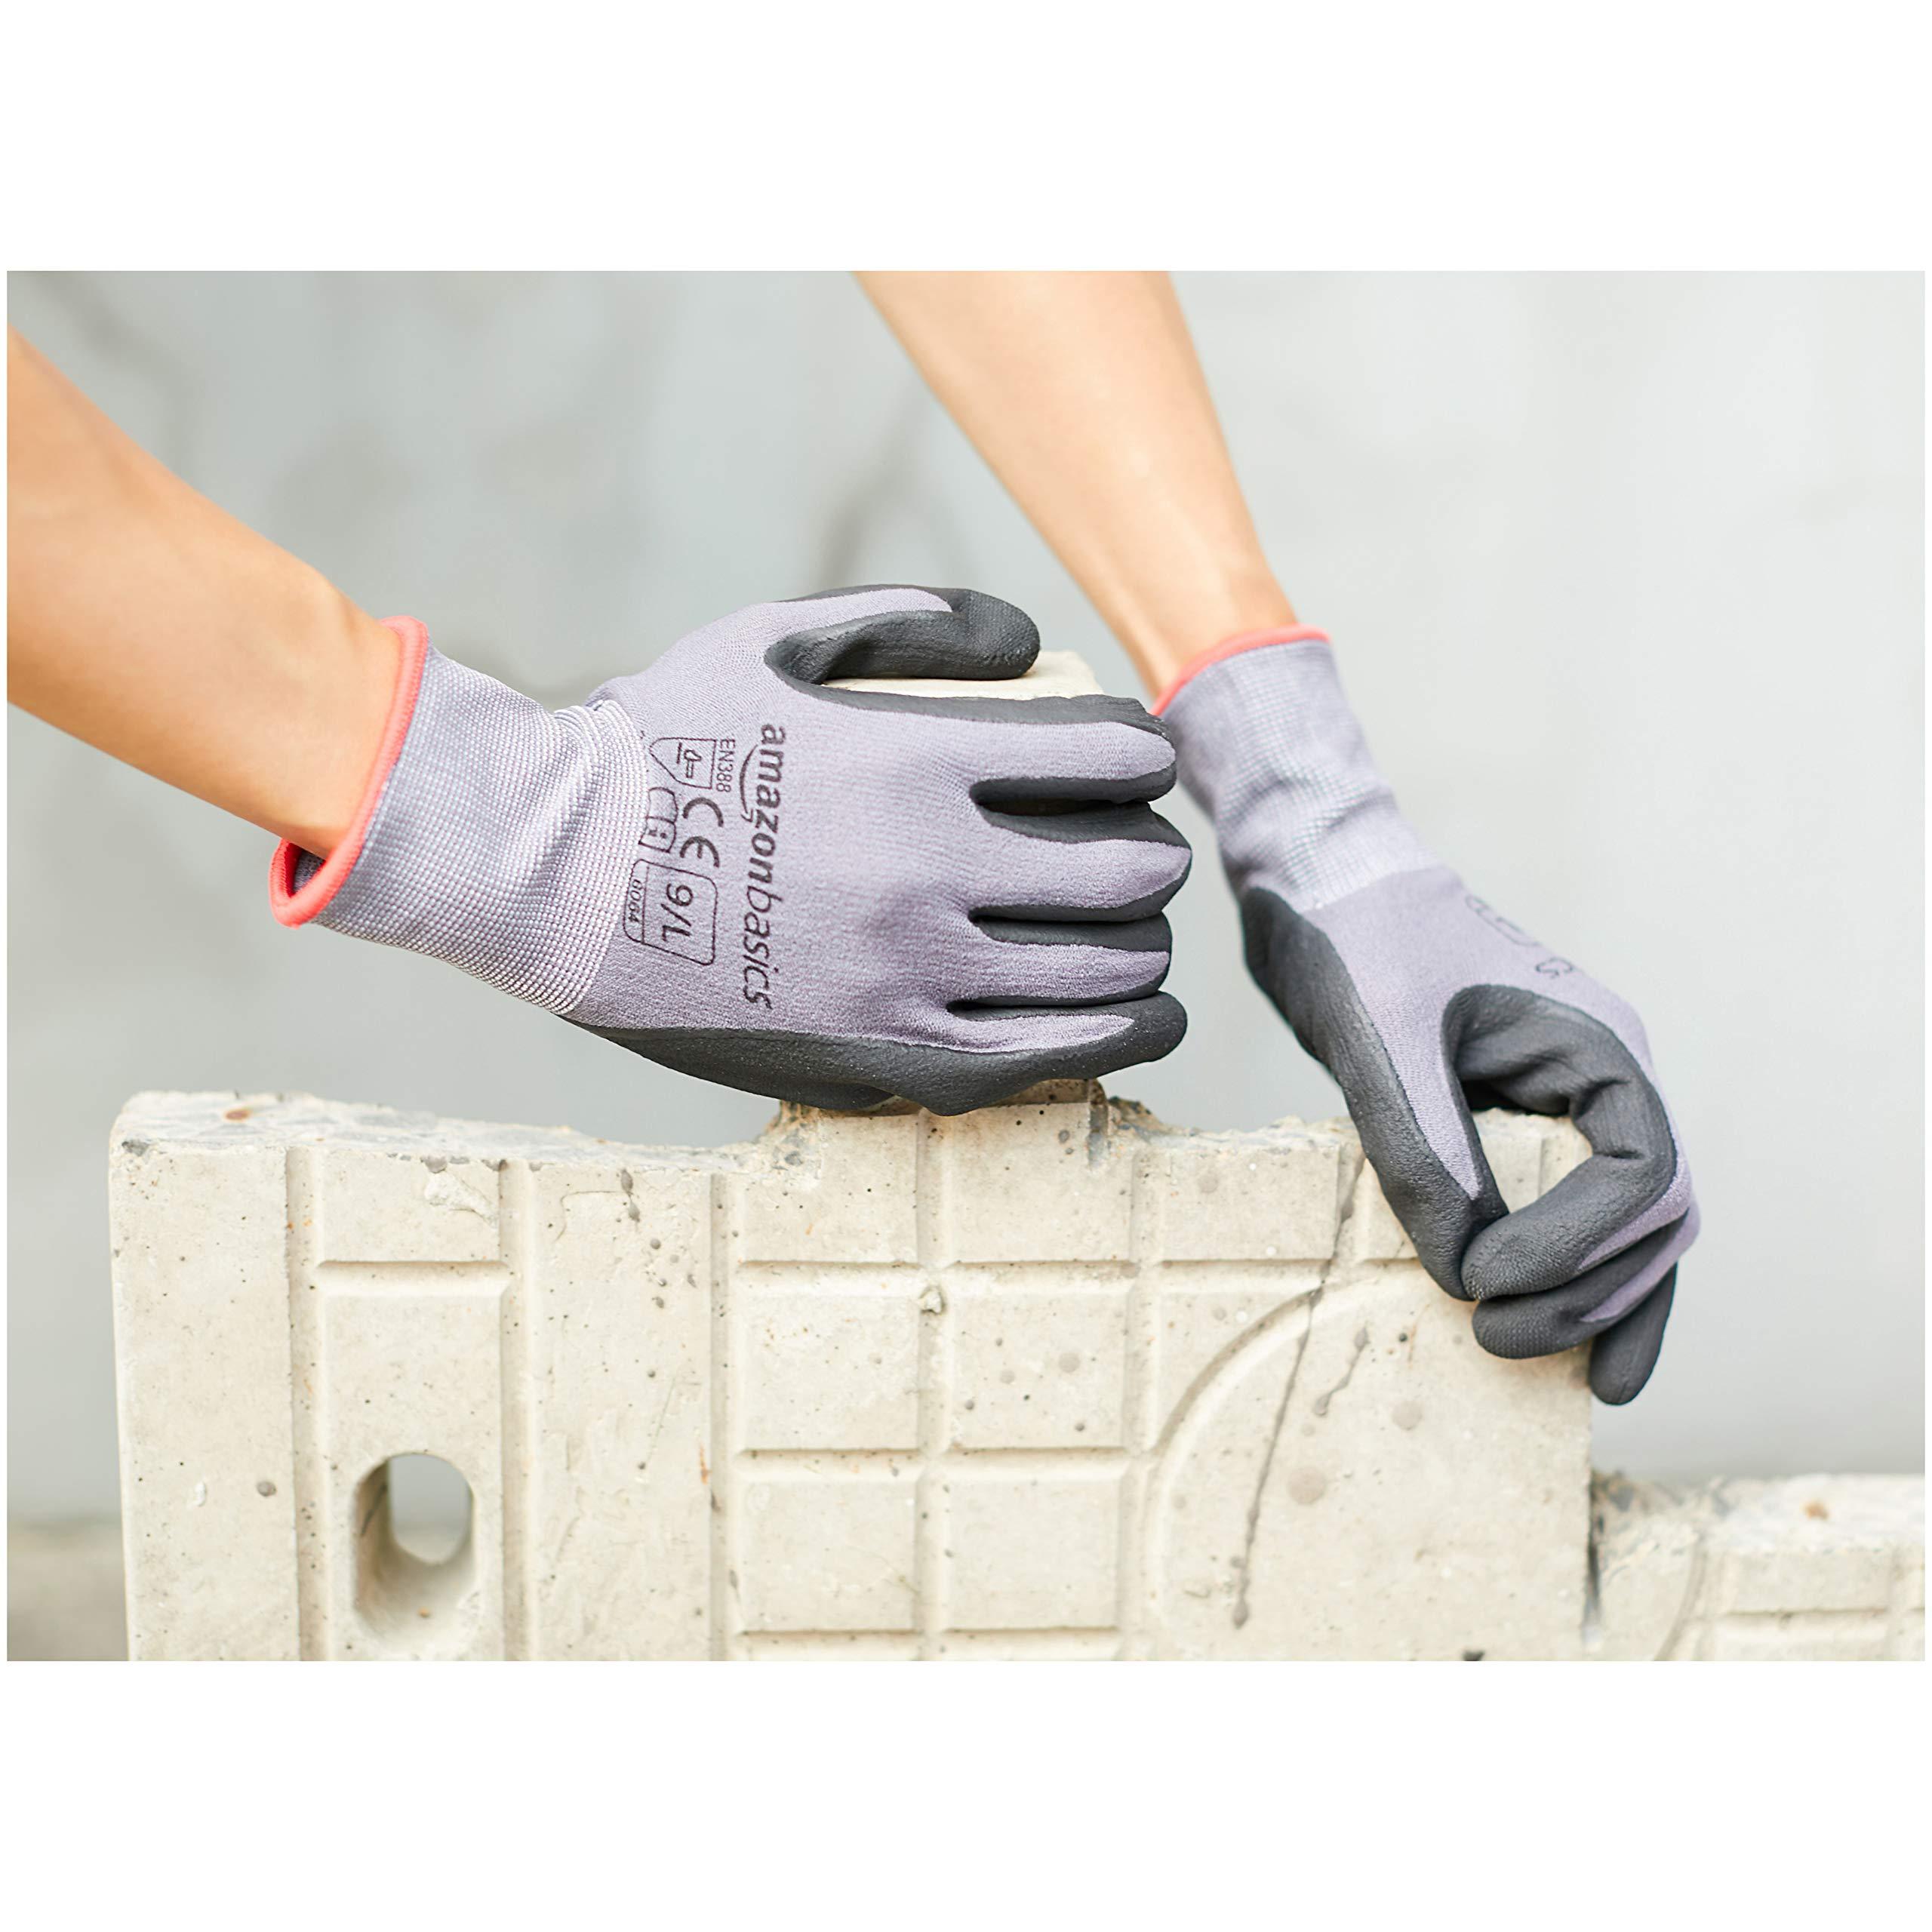 AmazonBasics Micro-Foam Nitrile Coated Work Gloves, Nylon Liner Fiber, Touch Screen, Grey, Size 9, L, 12-Pair by AmazonBasics (Image #2)